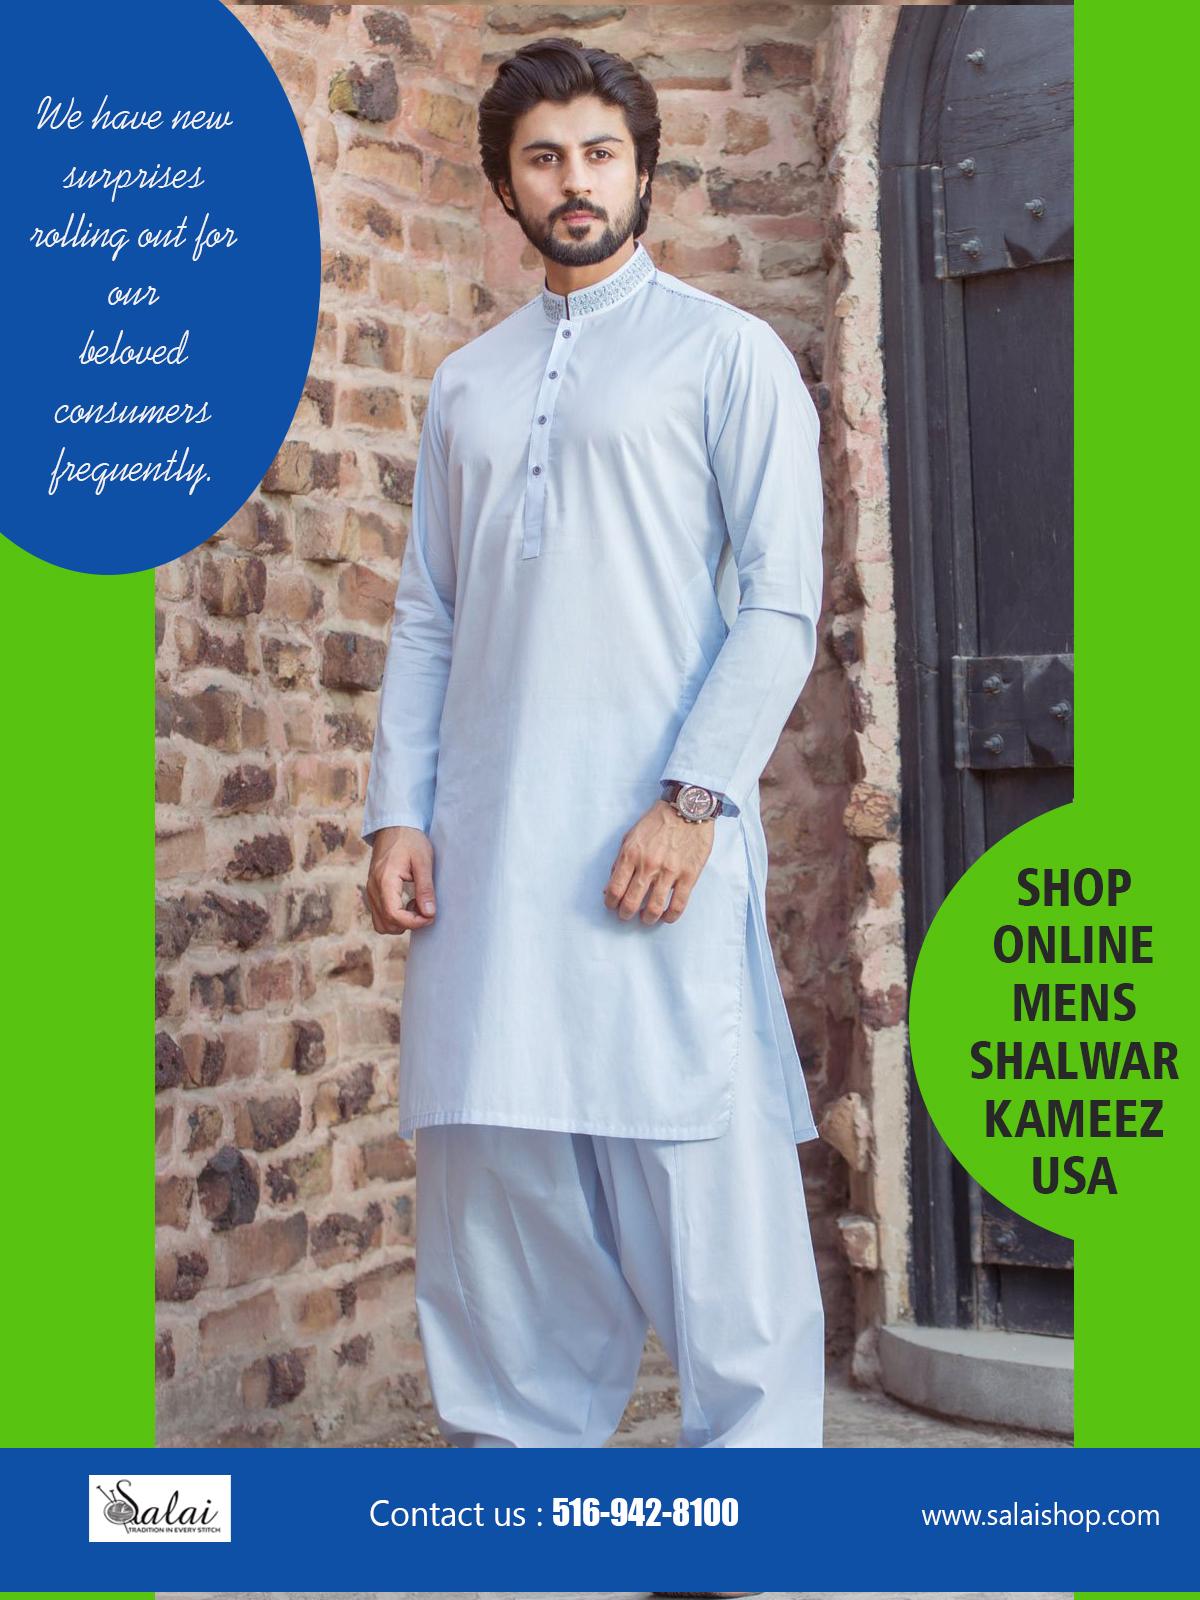 2d6a72e590 Best Place to Buy Salwar Kameez Online - Social Social Social | Social  Social Social